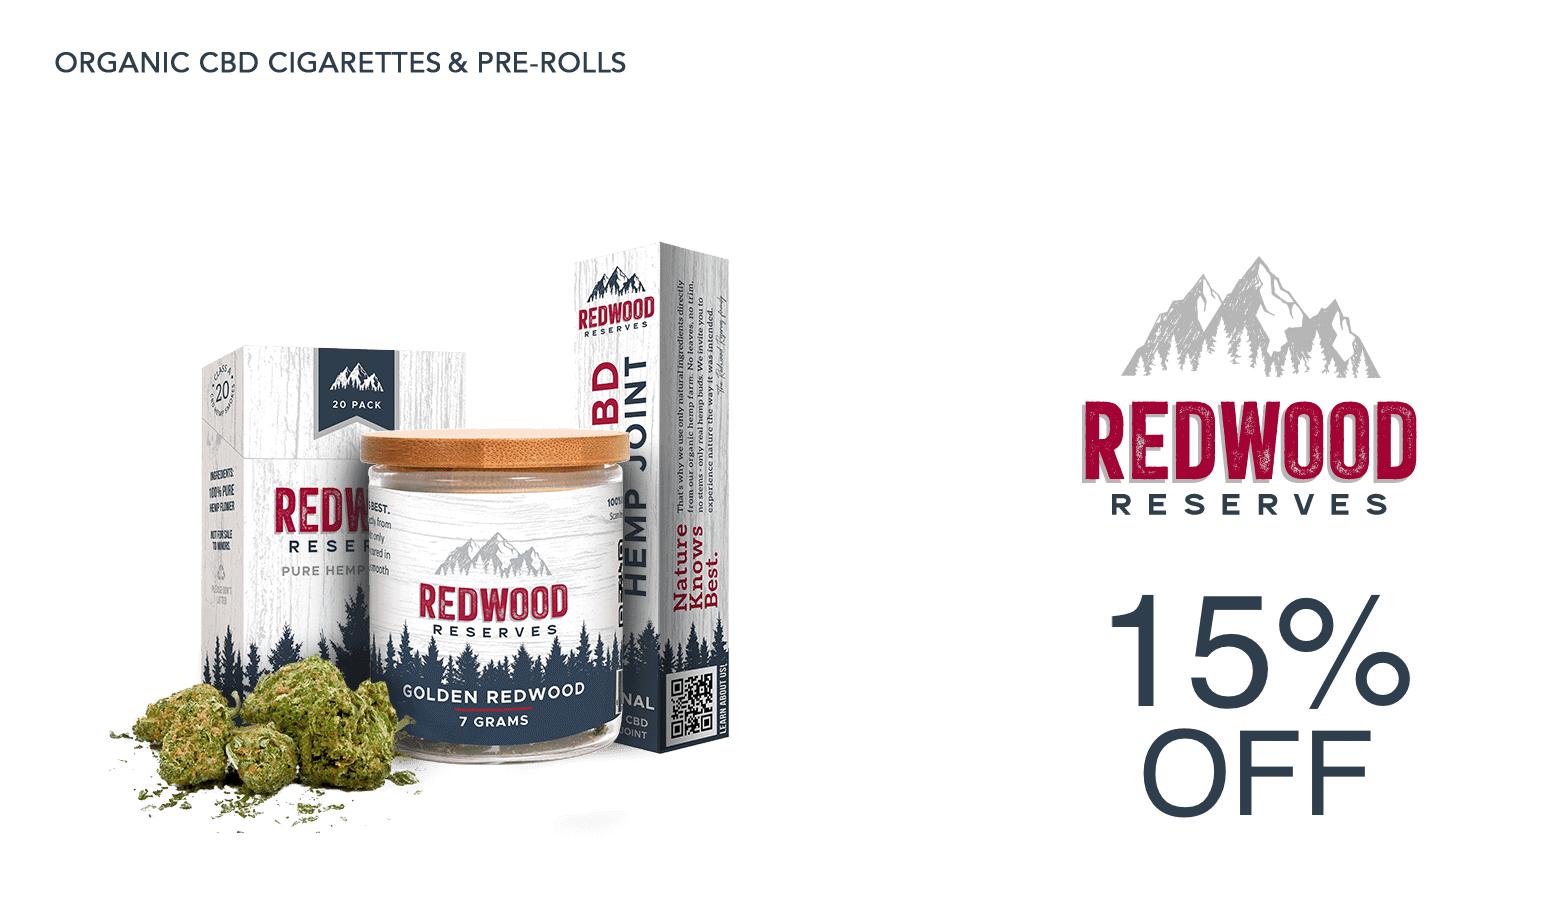 Redwood Reserves Coupon for CBD Prerolls